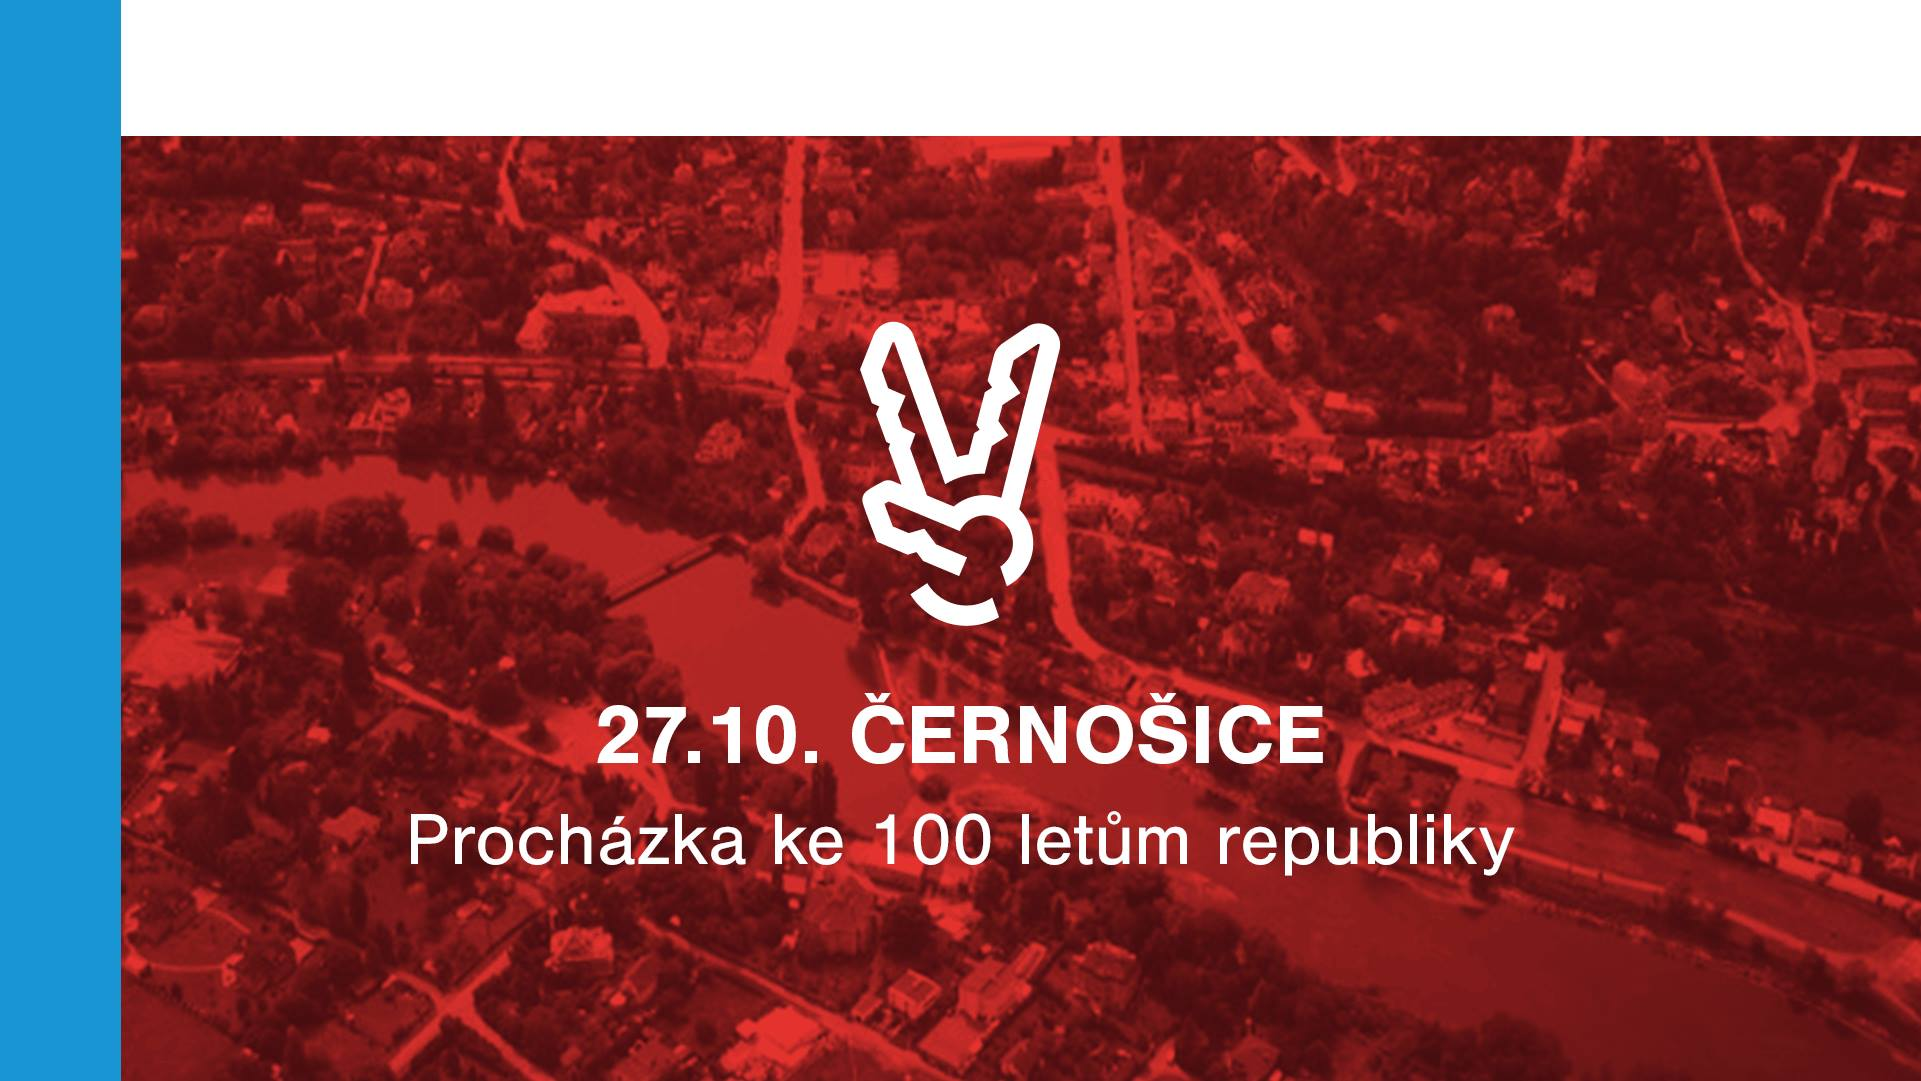 Procházka Černošicemi ke 100 letům republiky